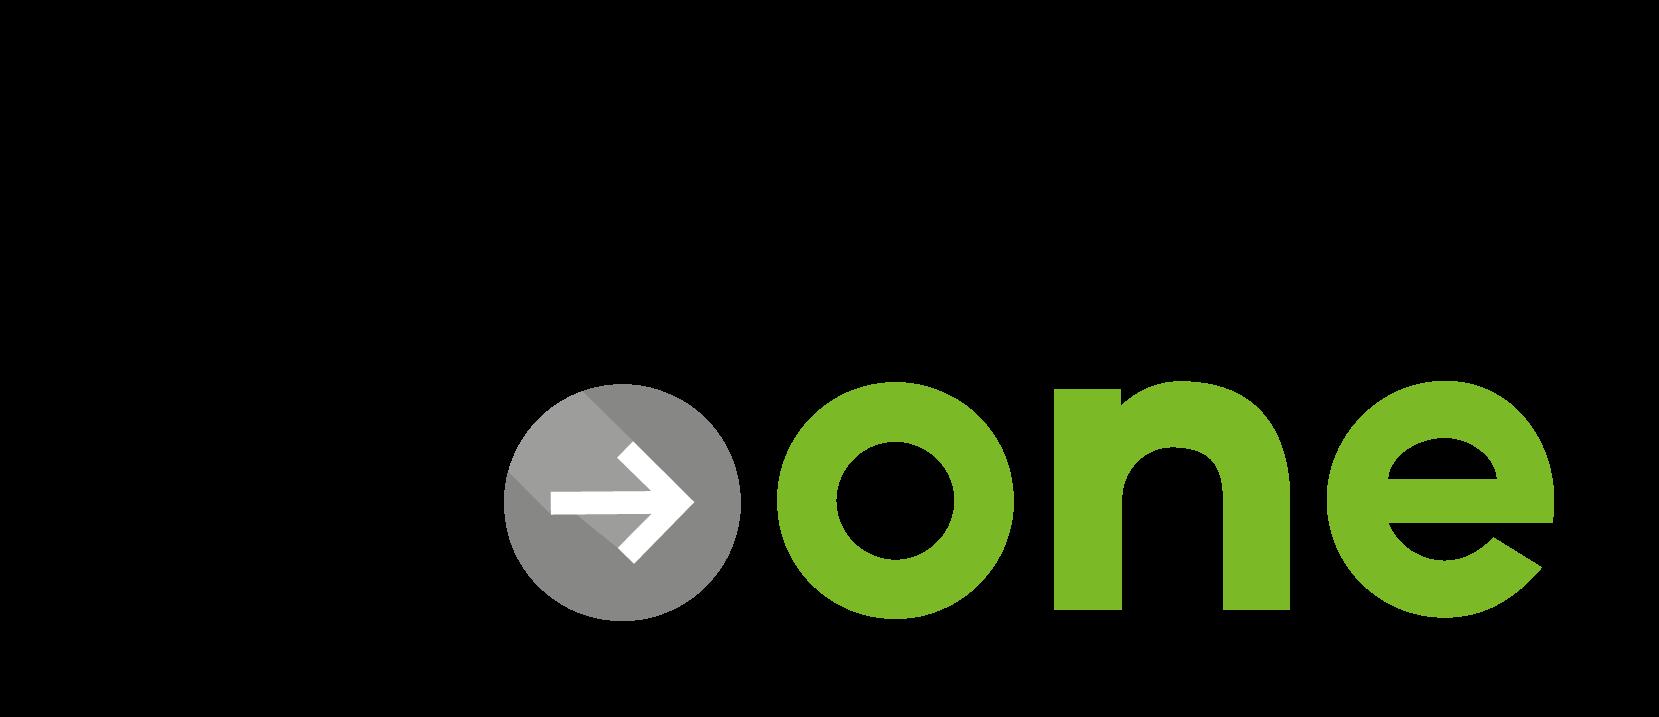 Zero to One Startup Accelerator